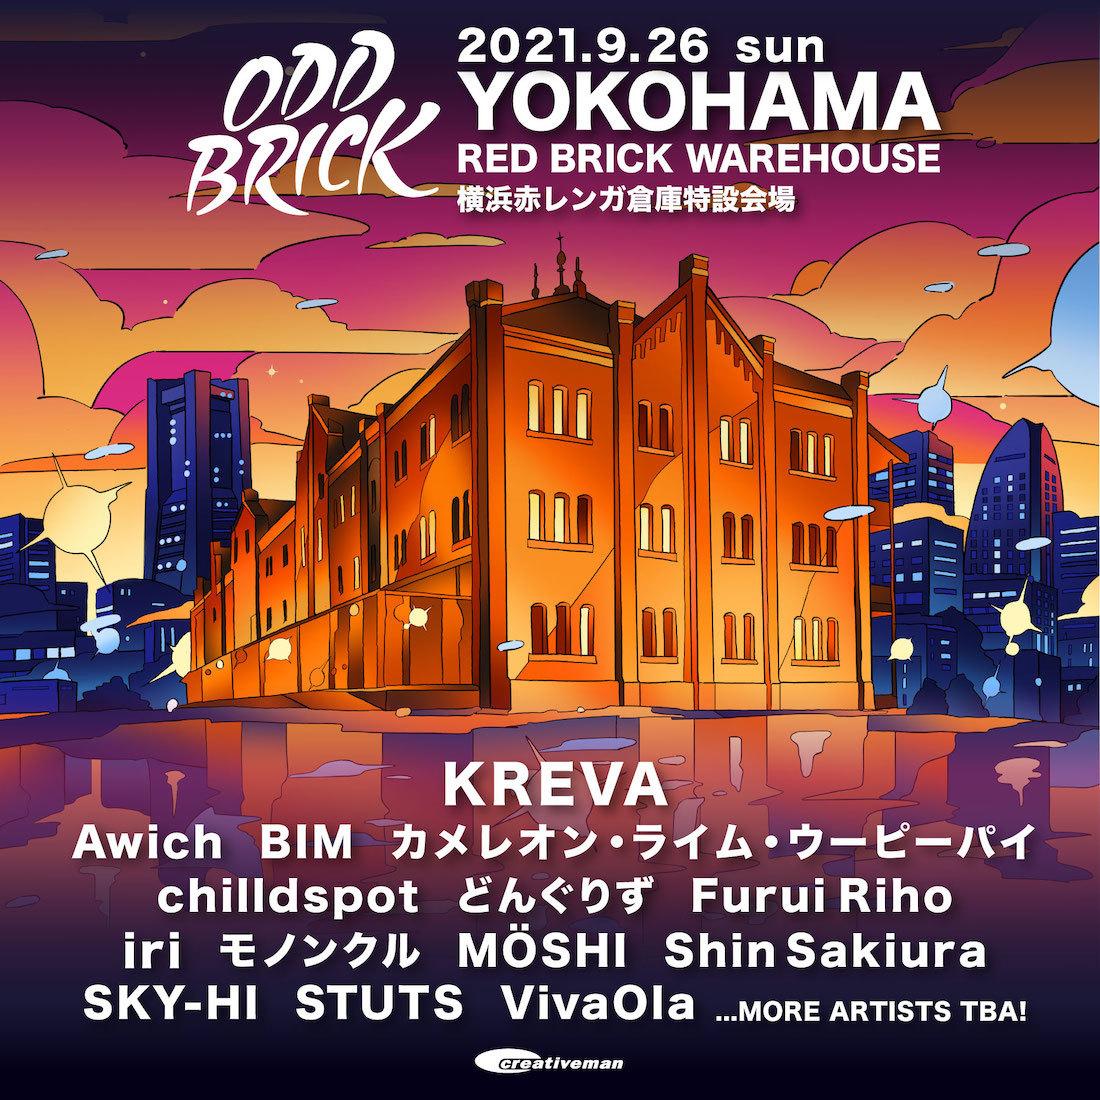 ODD BRICK FESTIVAL 2021